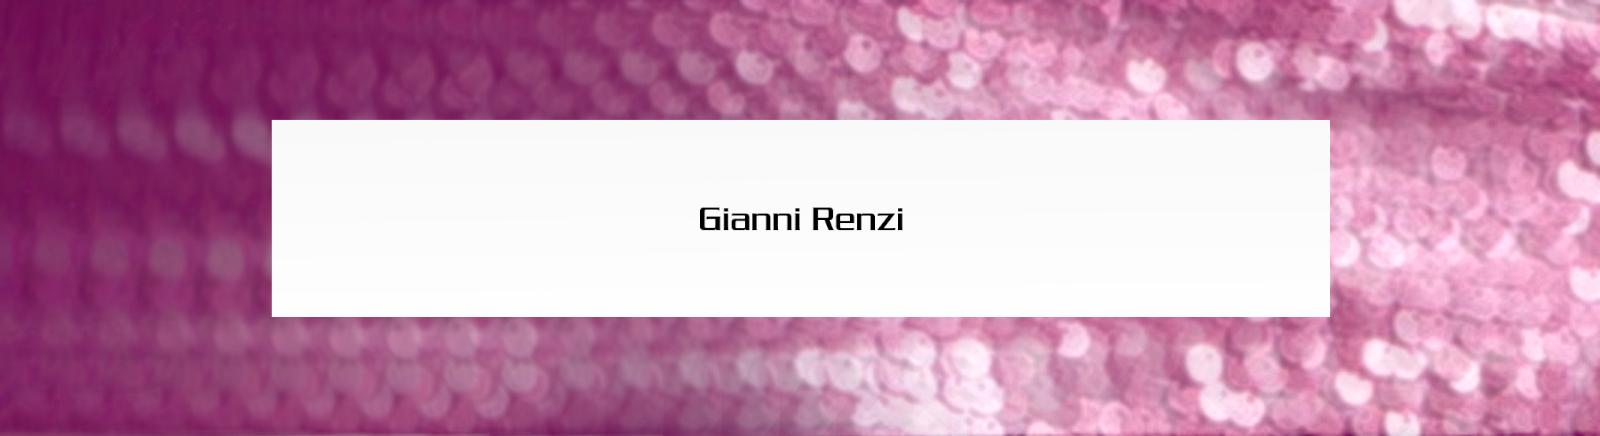 Gisy: Gianni Renzi Winter Boots für Damen online shoppen